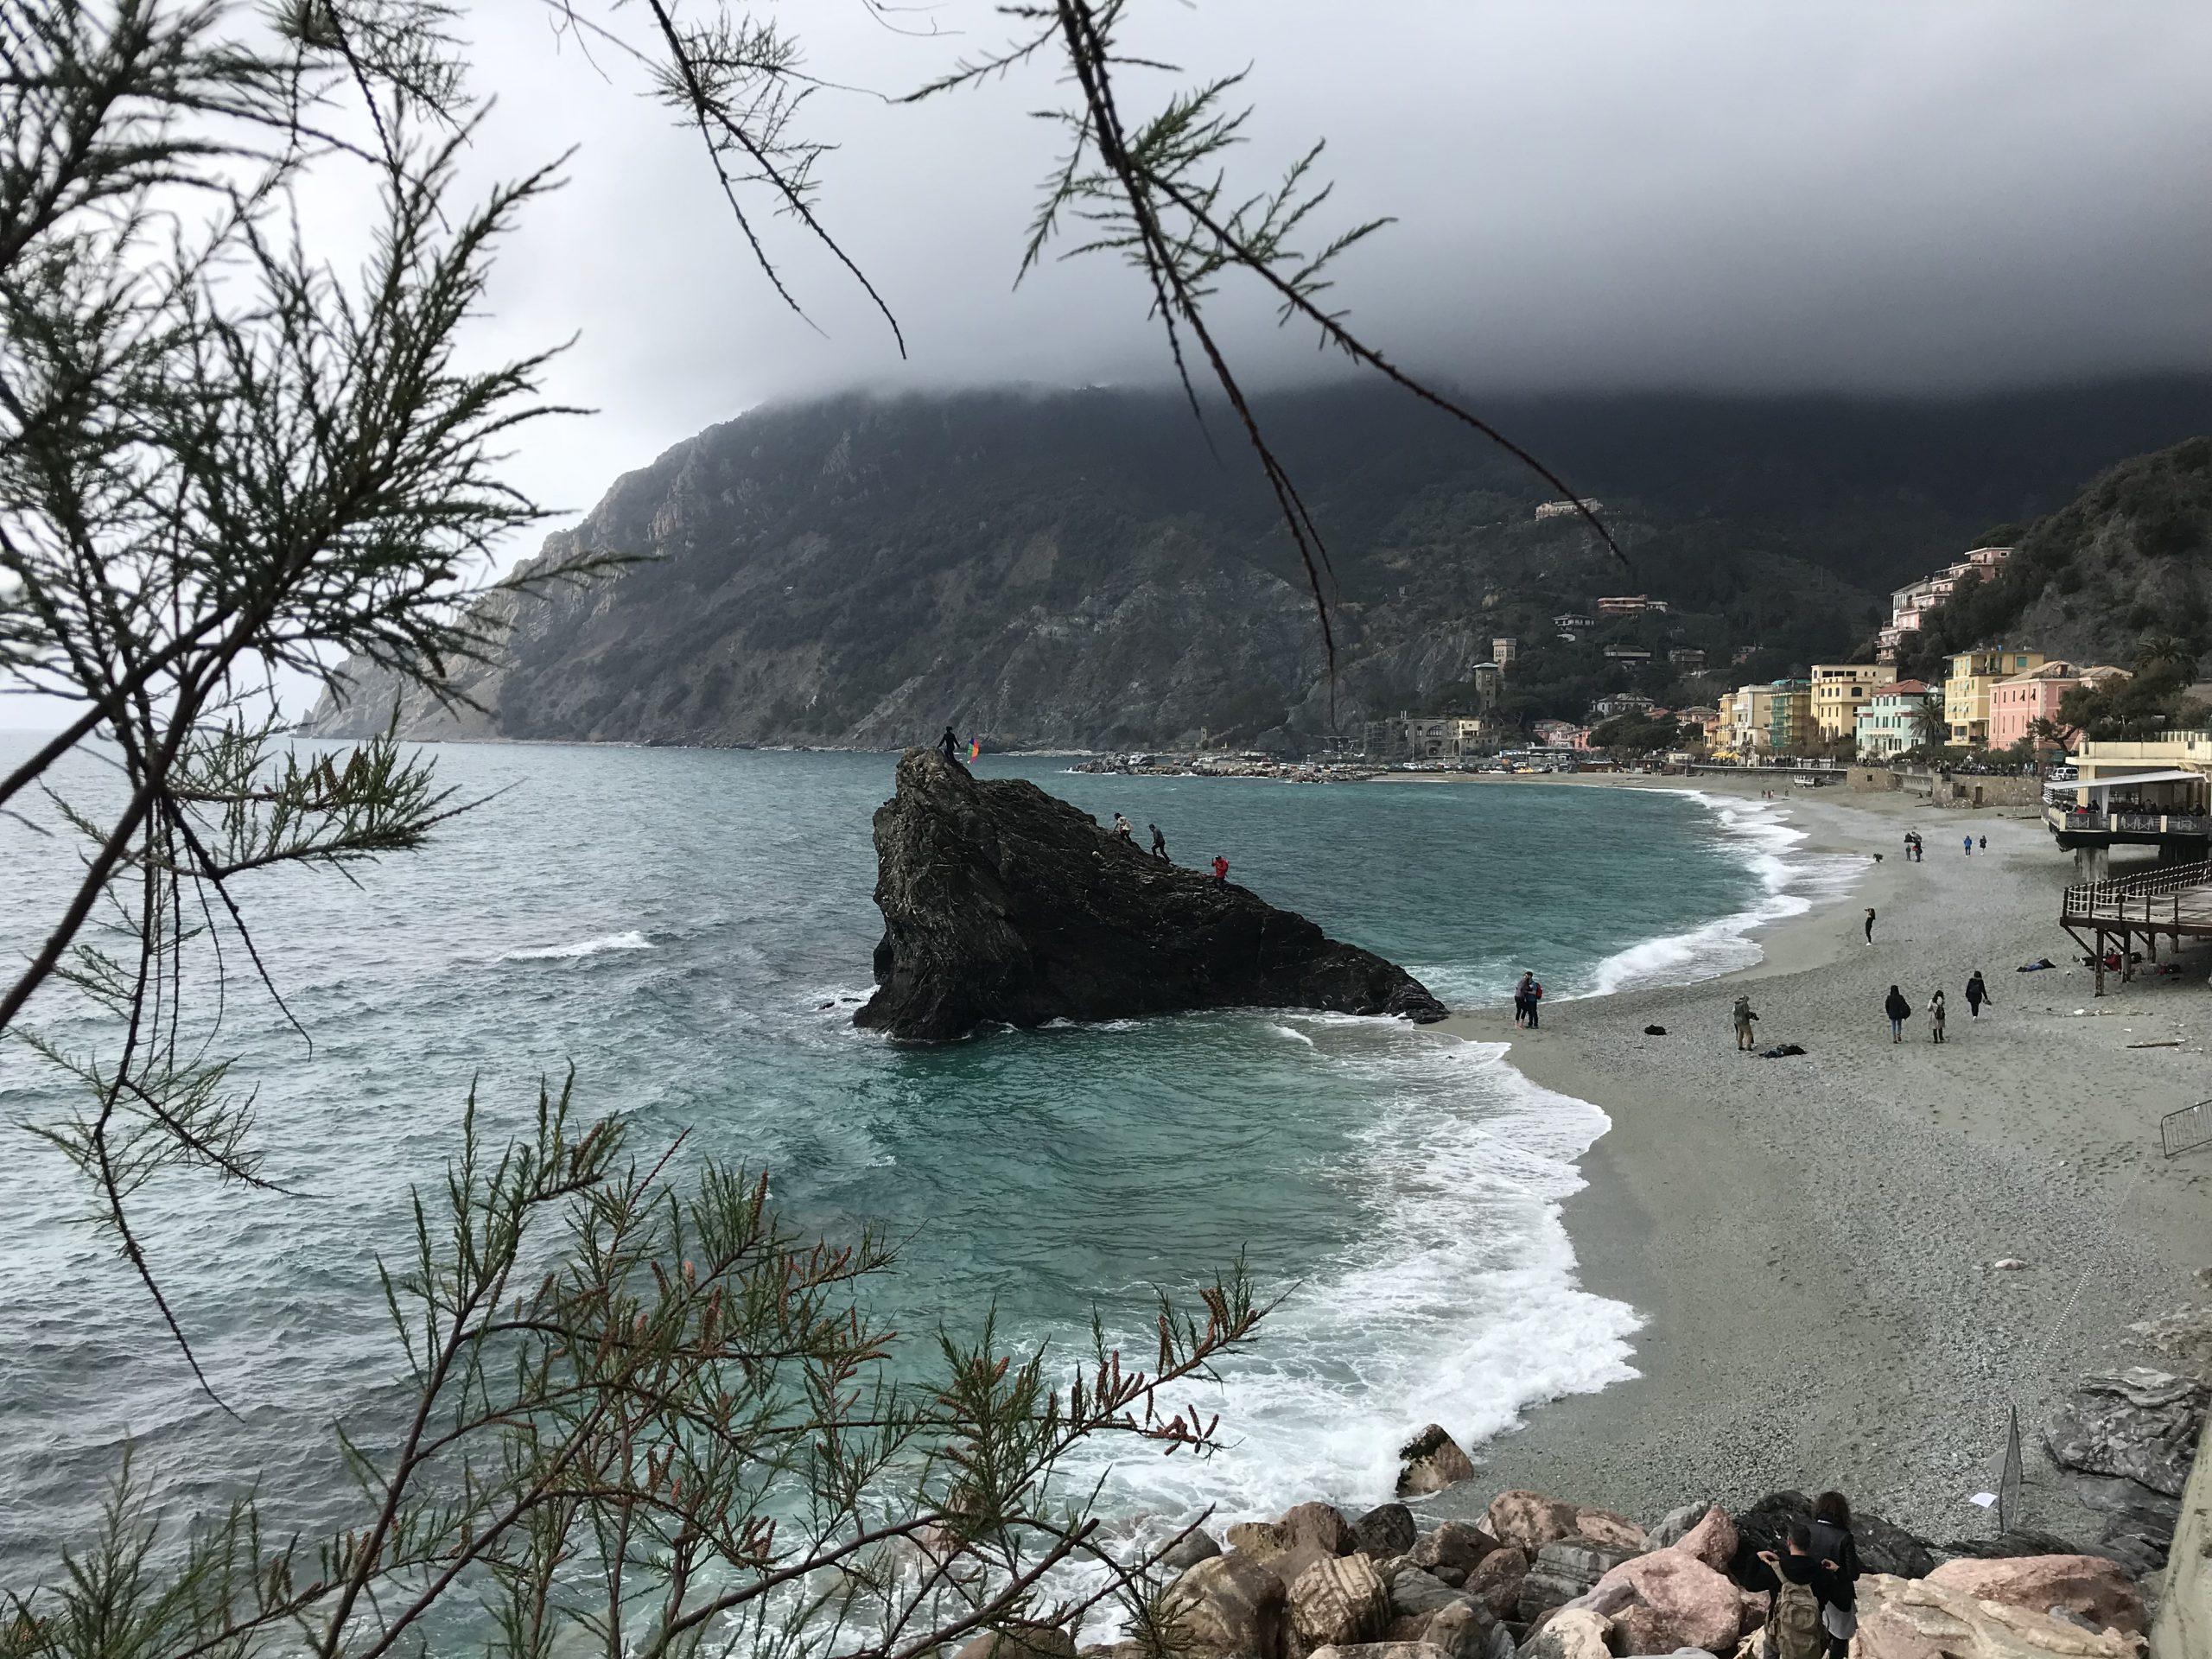 Der Strand von Monterosso al Mare, Cinque Terre, Italien